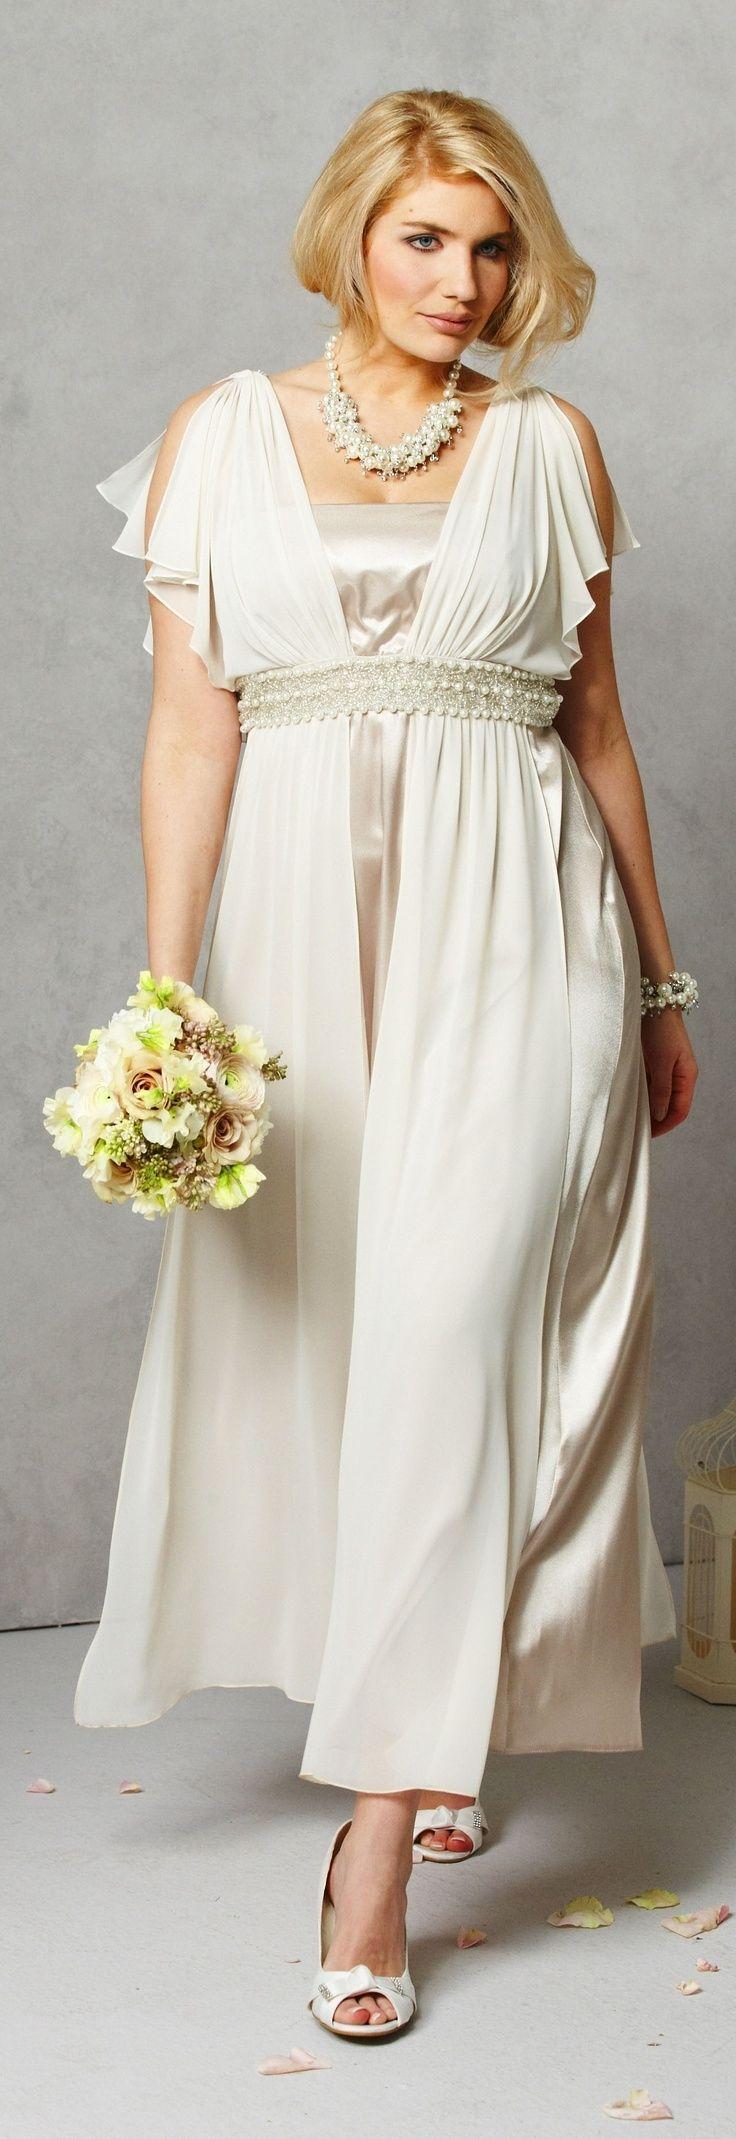 Wedding Dresses For Old Fat Brides   Wedding Dress   Pinterest   Fat ...